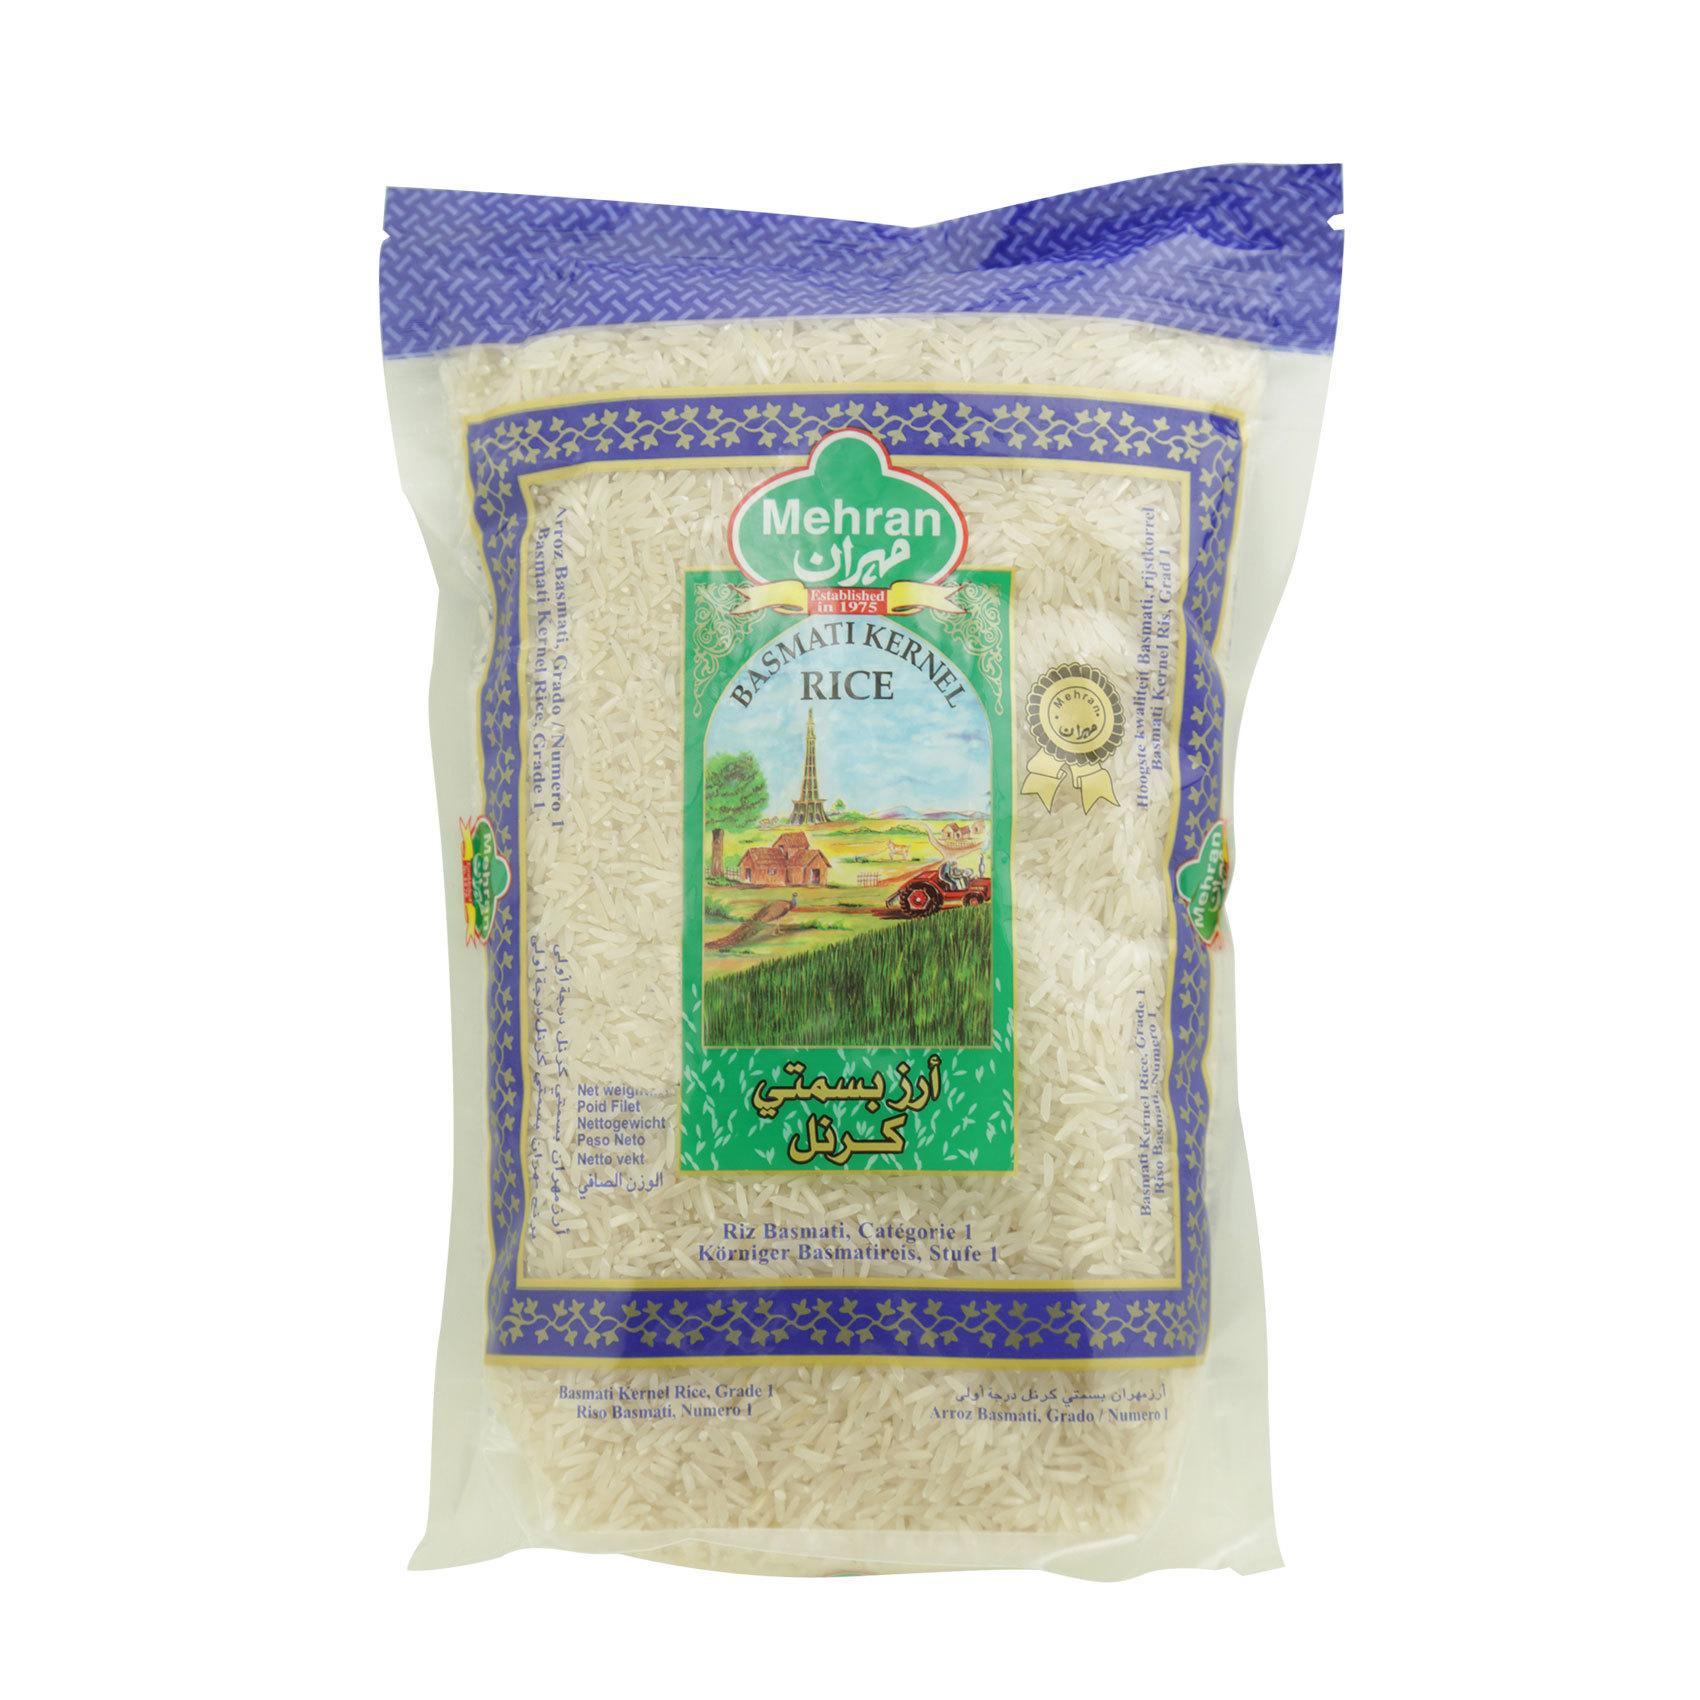 Buy Mehran Basmati Kernel Rice 1 Kg Online Shop Food Cupboard On Carrefour Saudi Arabia